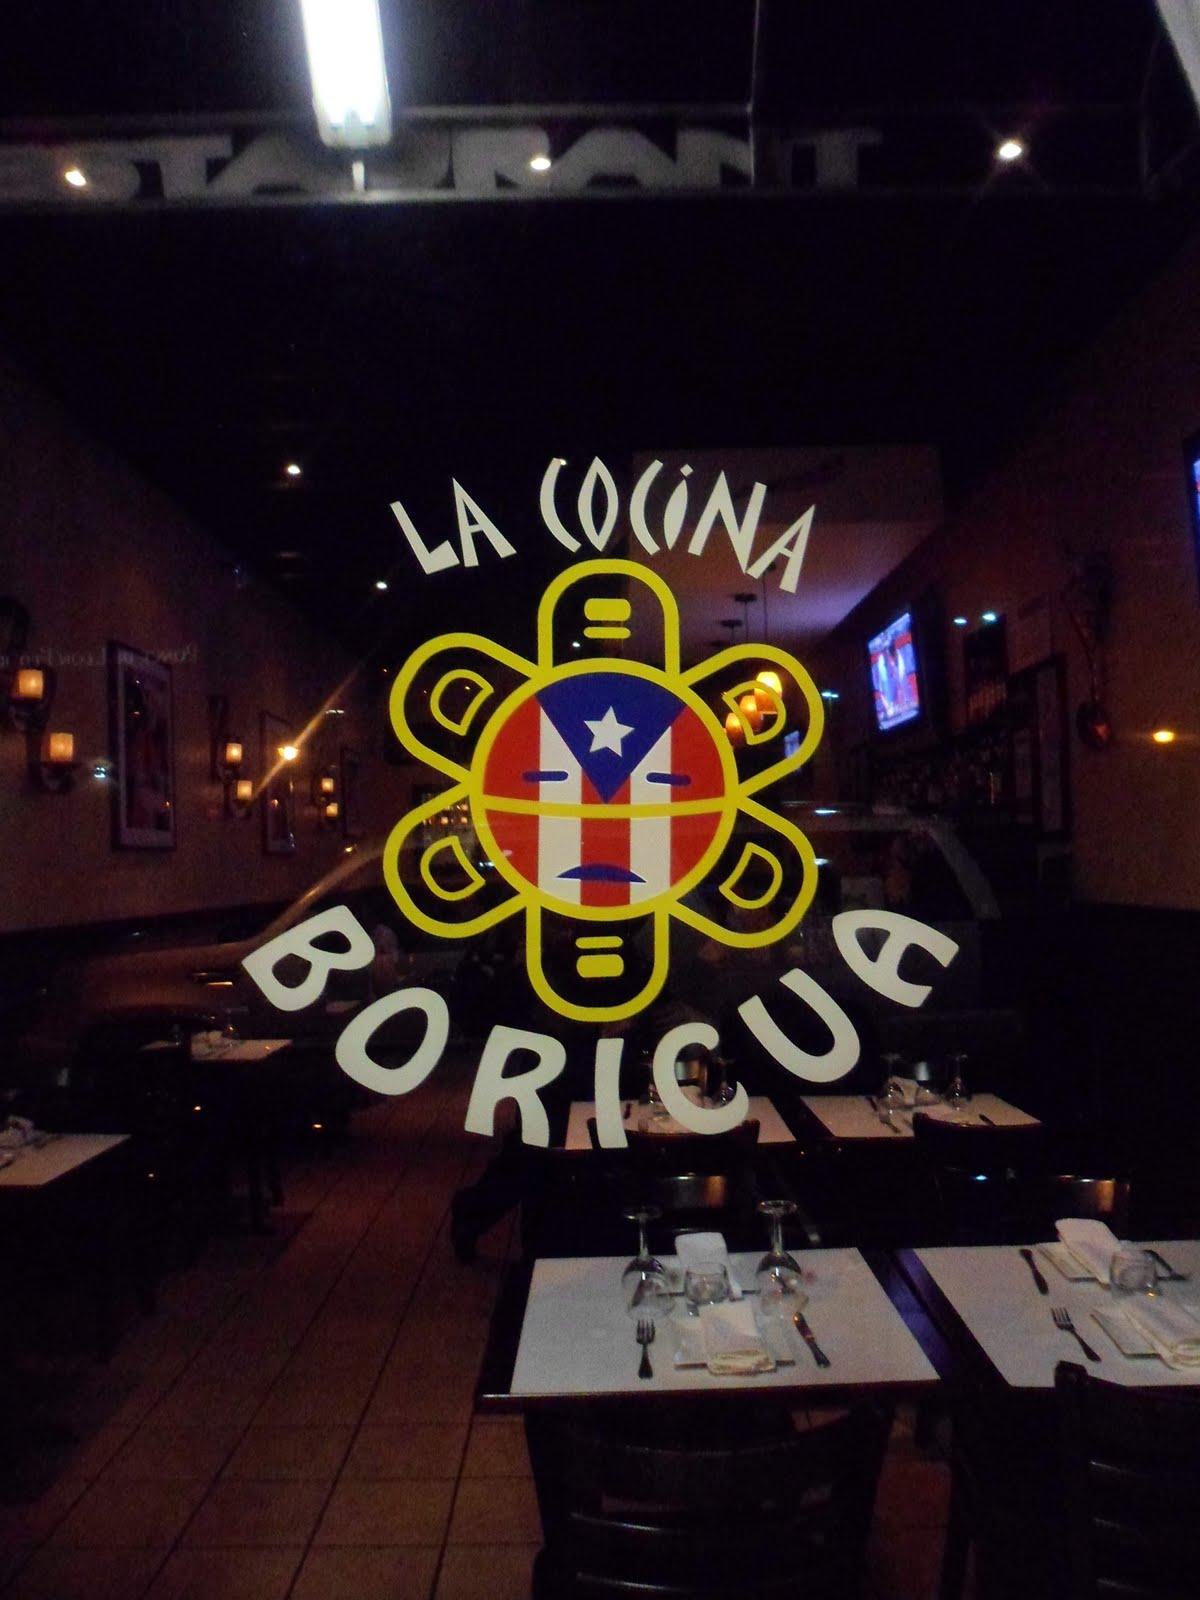 LOUISE CAZLEY Restaurant of the Month  La Cocina Boricua